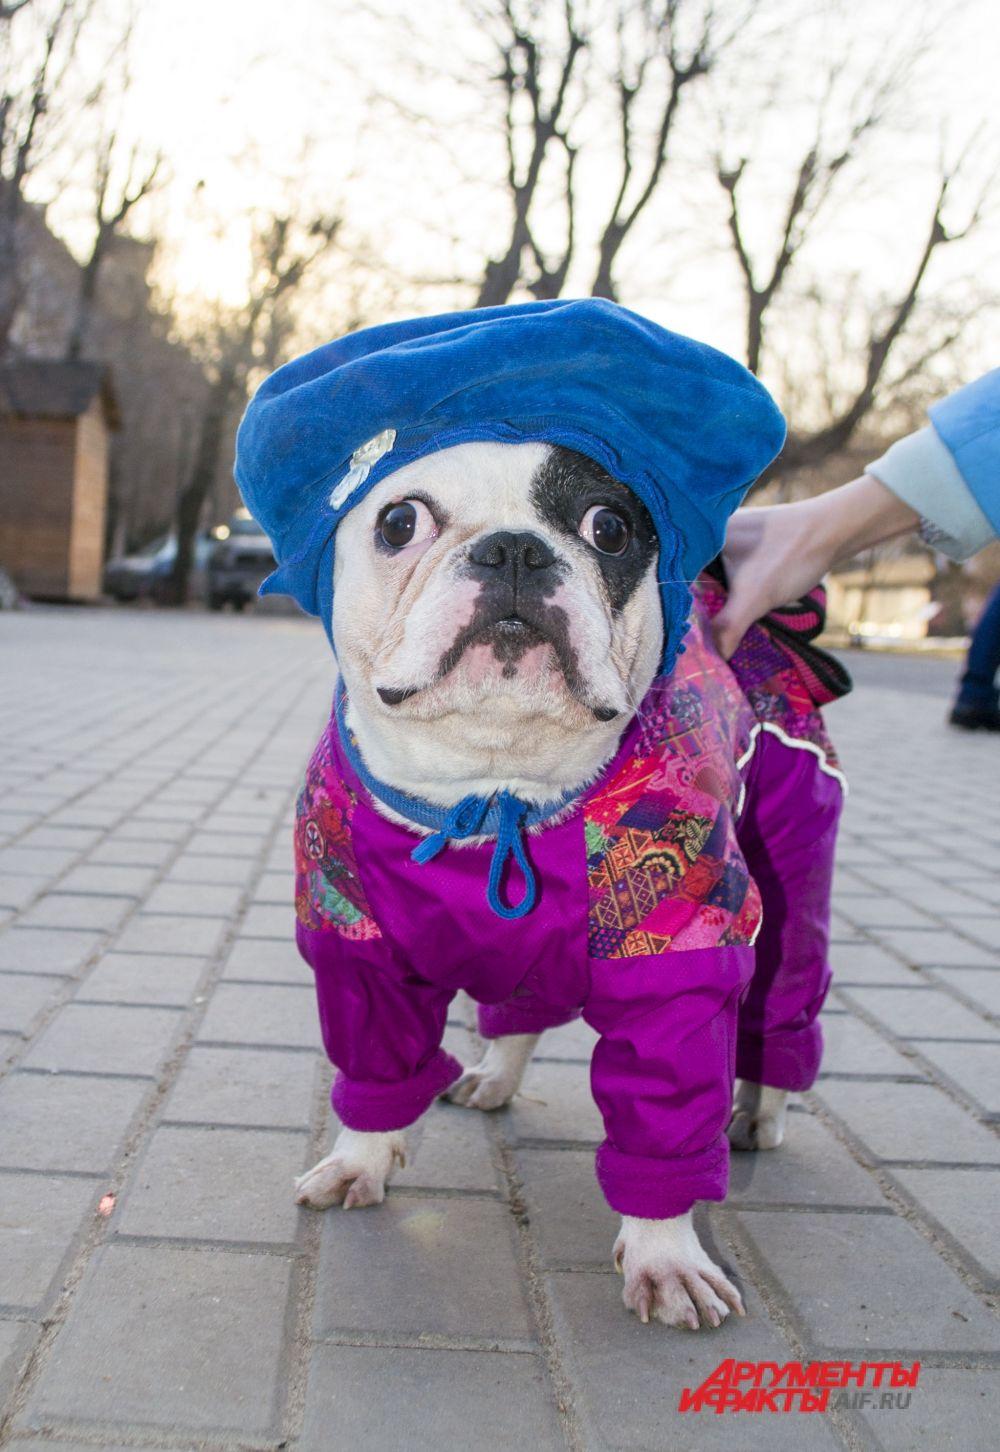 Французский бульдог Тина, костюм «Слава Женскому ВДВ».